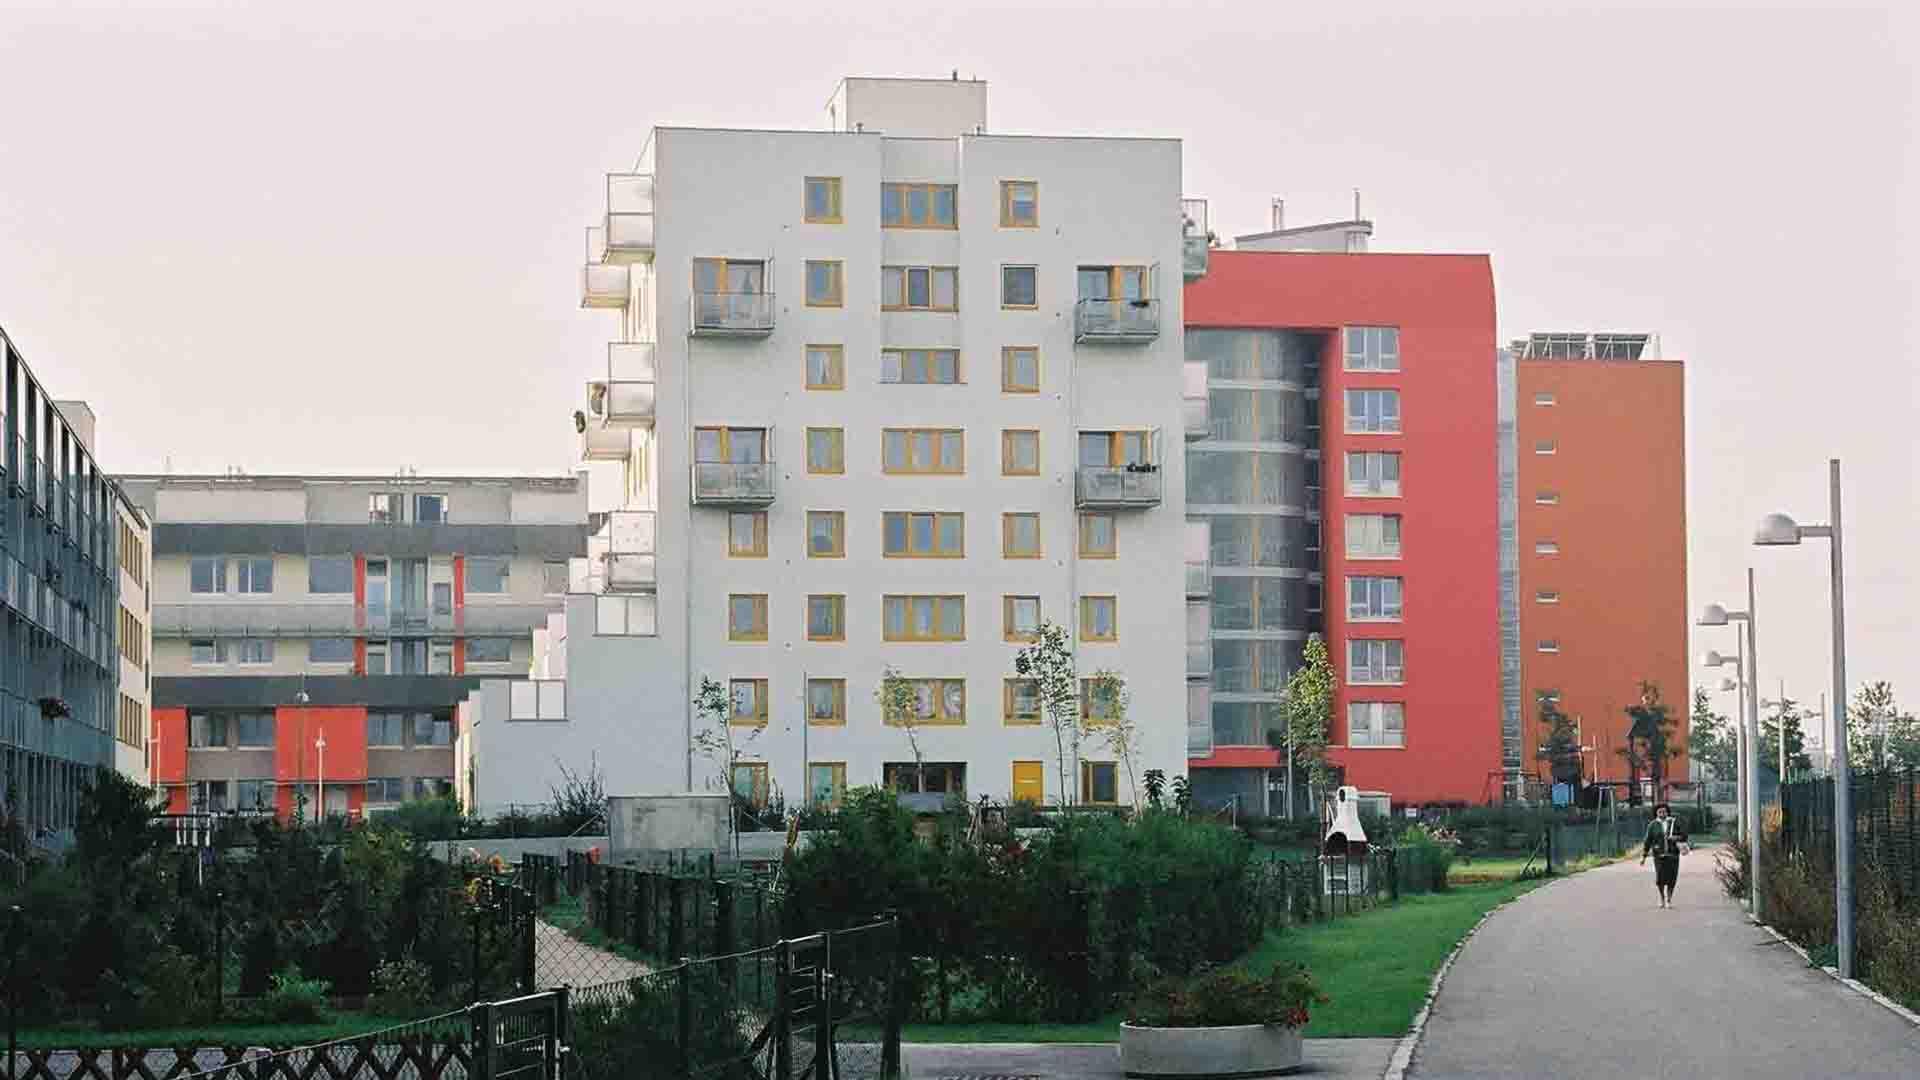 2b_PLAYstudio_Liesing area-Wien_2004